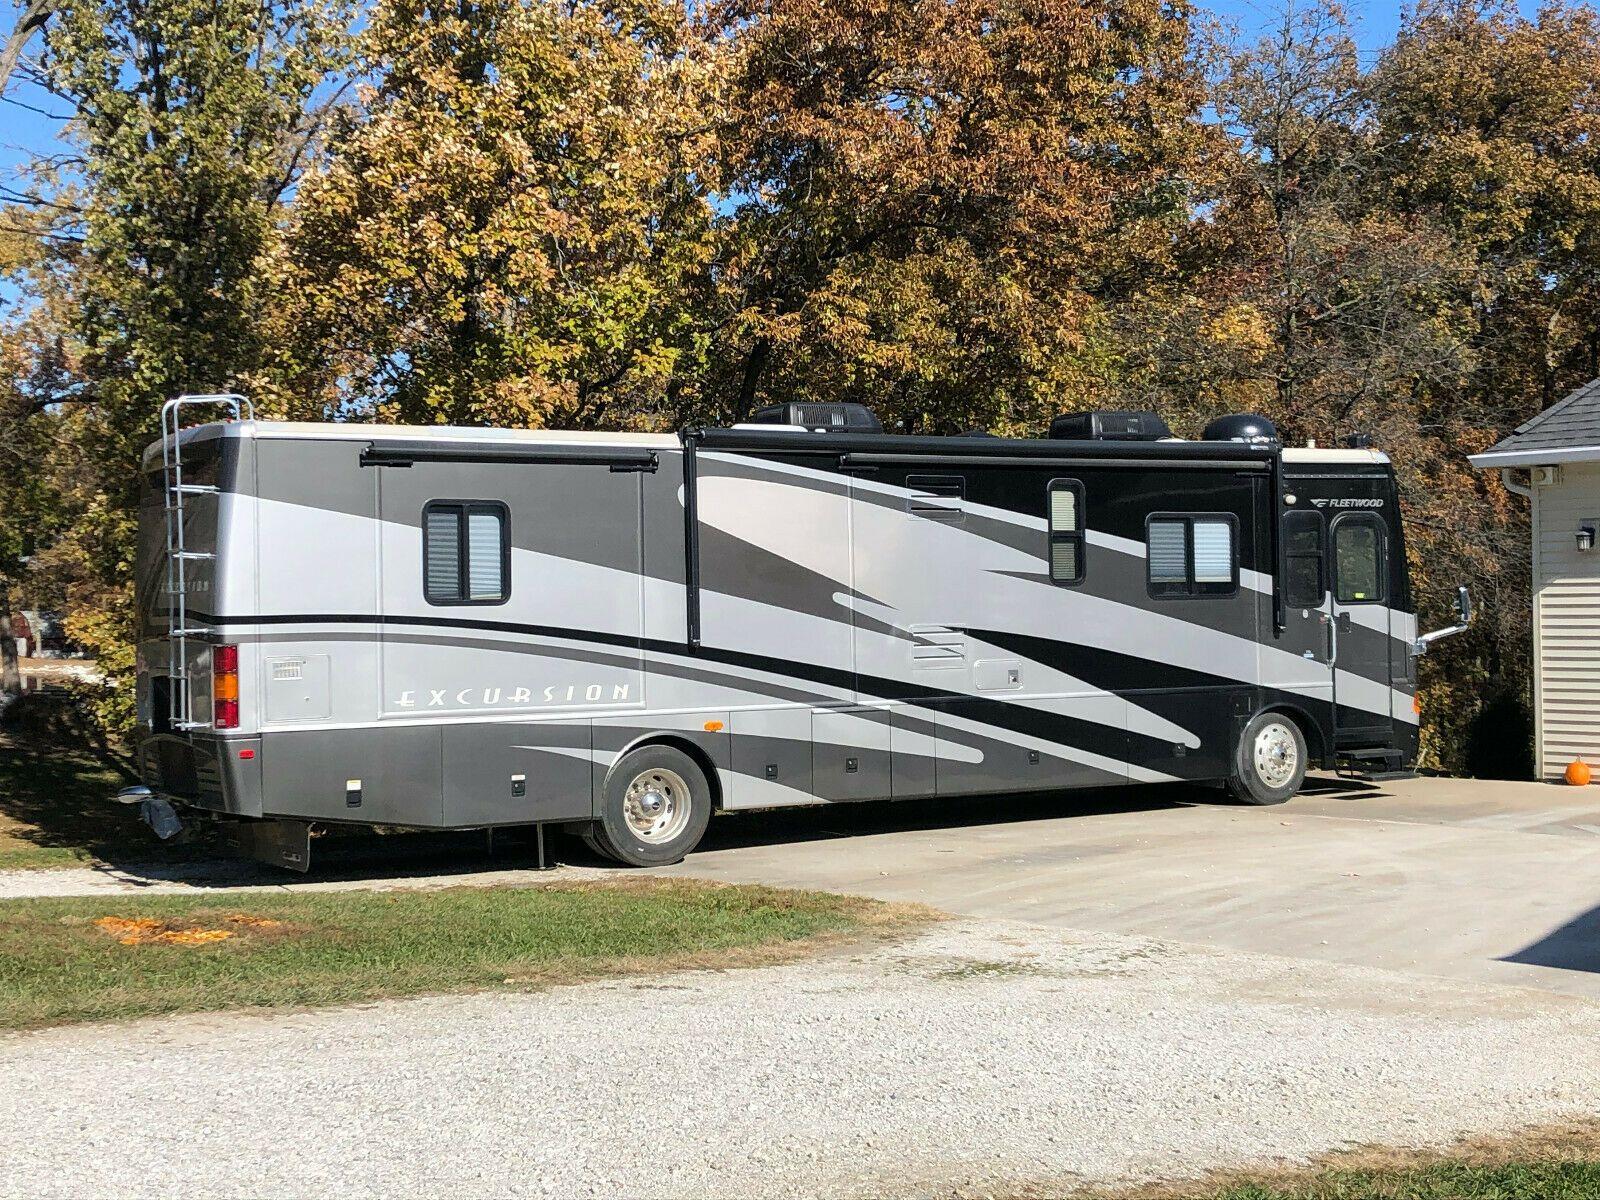 Excellent shape 2006 Fleetwood Excursion camper for sale